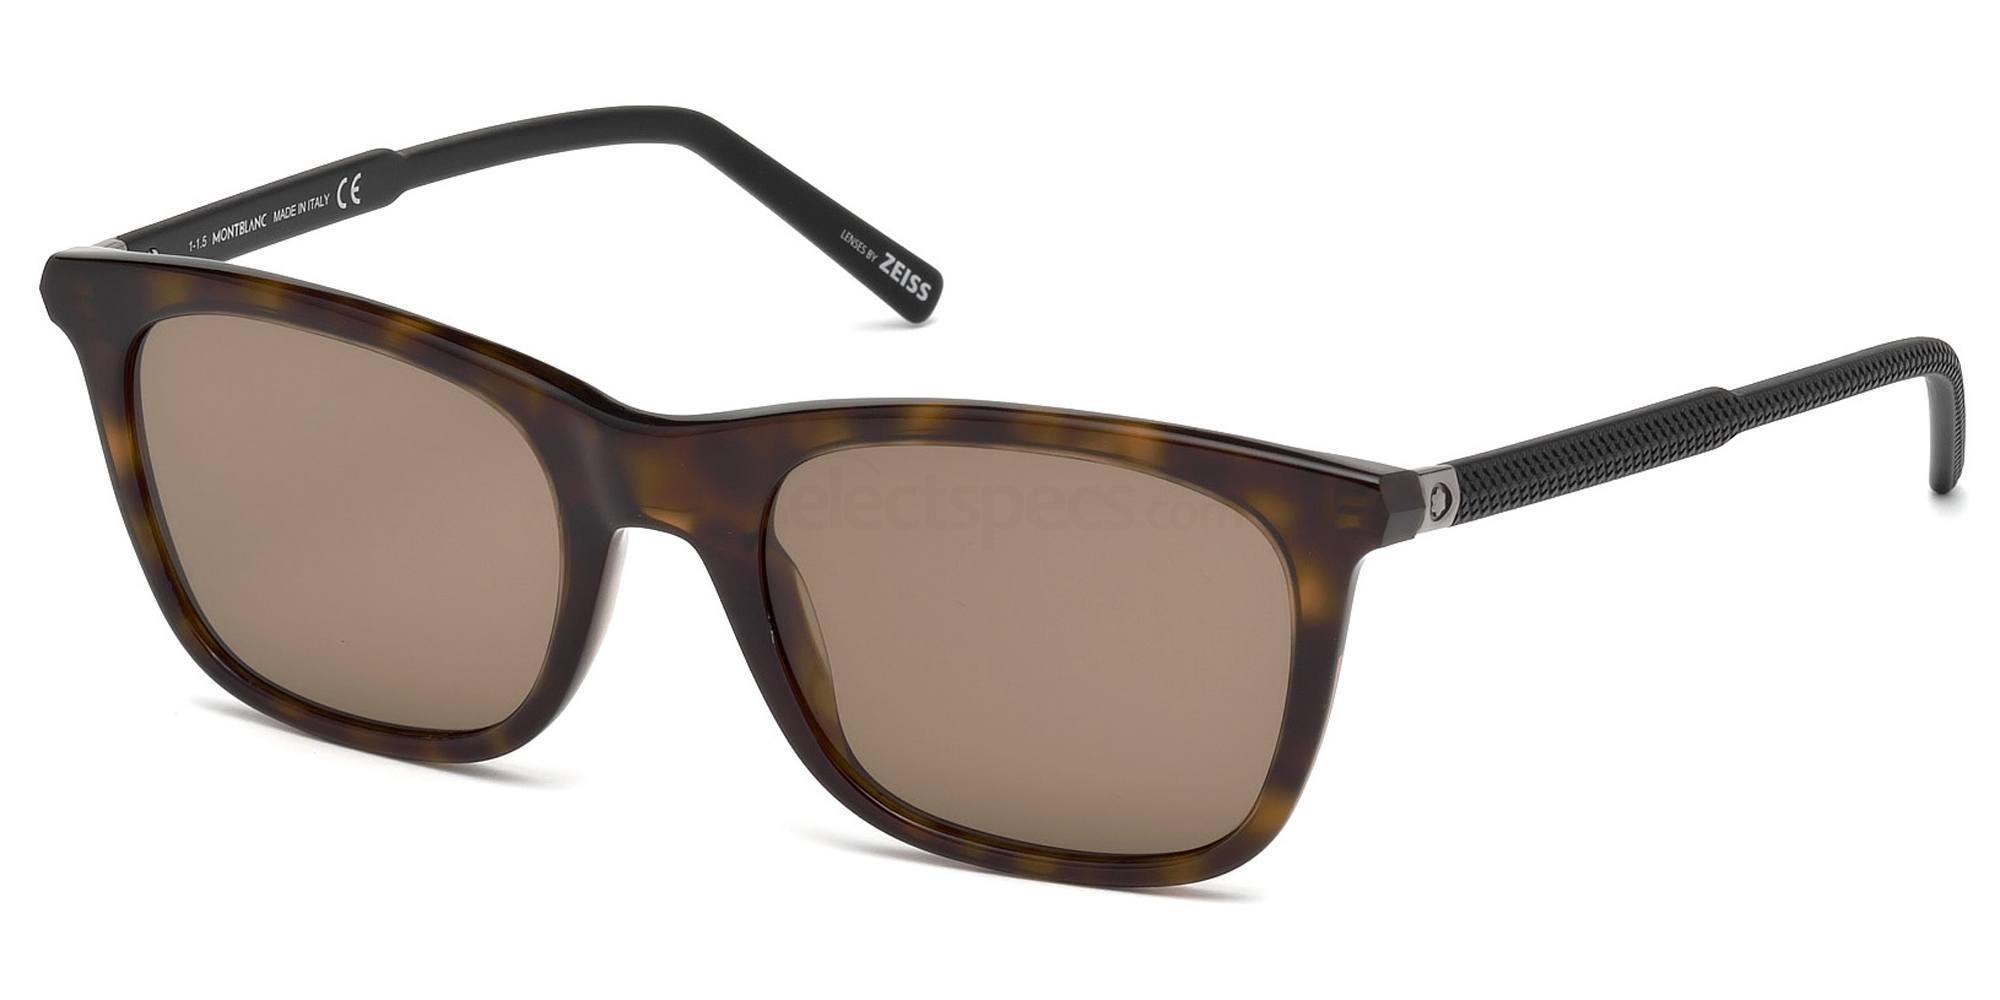 52J MB607S Sunglasses, Mont Blanc